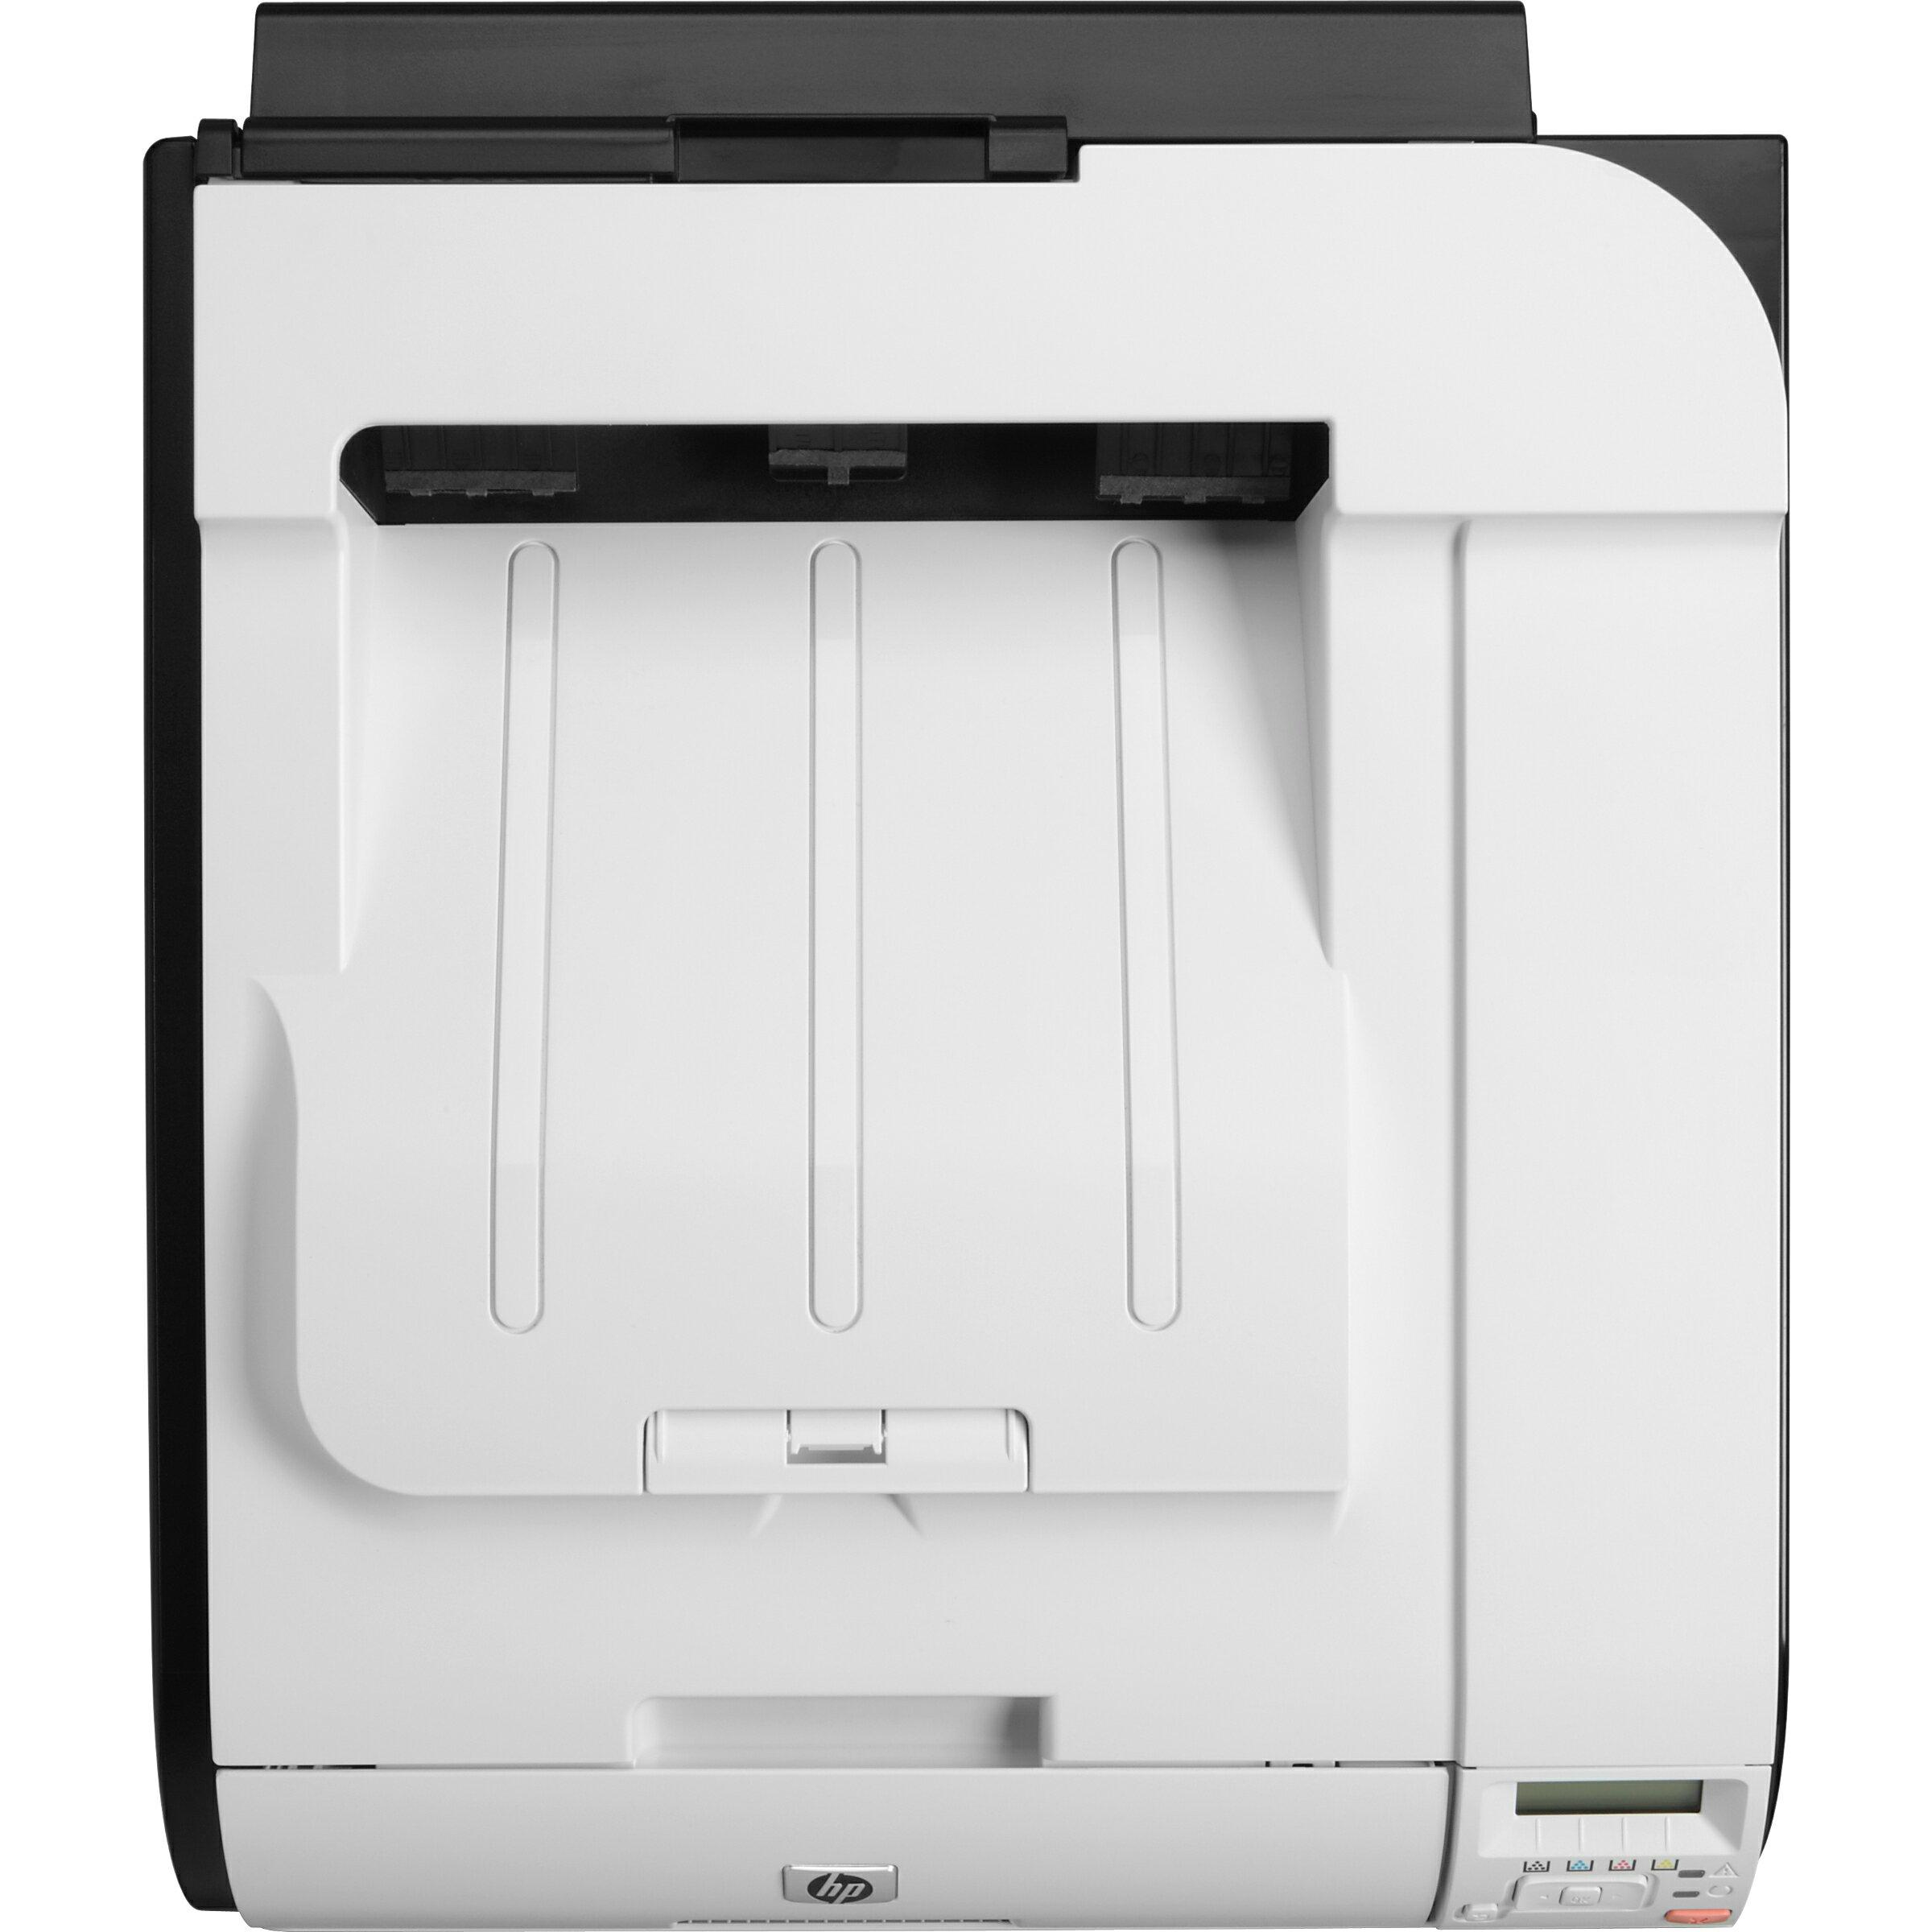 HP LaserJet Pro 400 M451DN Laser Printer - Refurbished - Color - 600 x 600 dpi Print - Plain Paper Print - Desktop - 21 ppm Mono / 21 ppm Color Print - 300 sheets Standard Input Capacity - 40000 pages per month - Automatic Duplex Print - LCD - Ethernet - 4